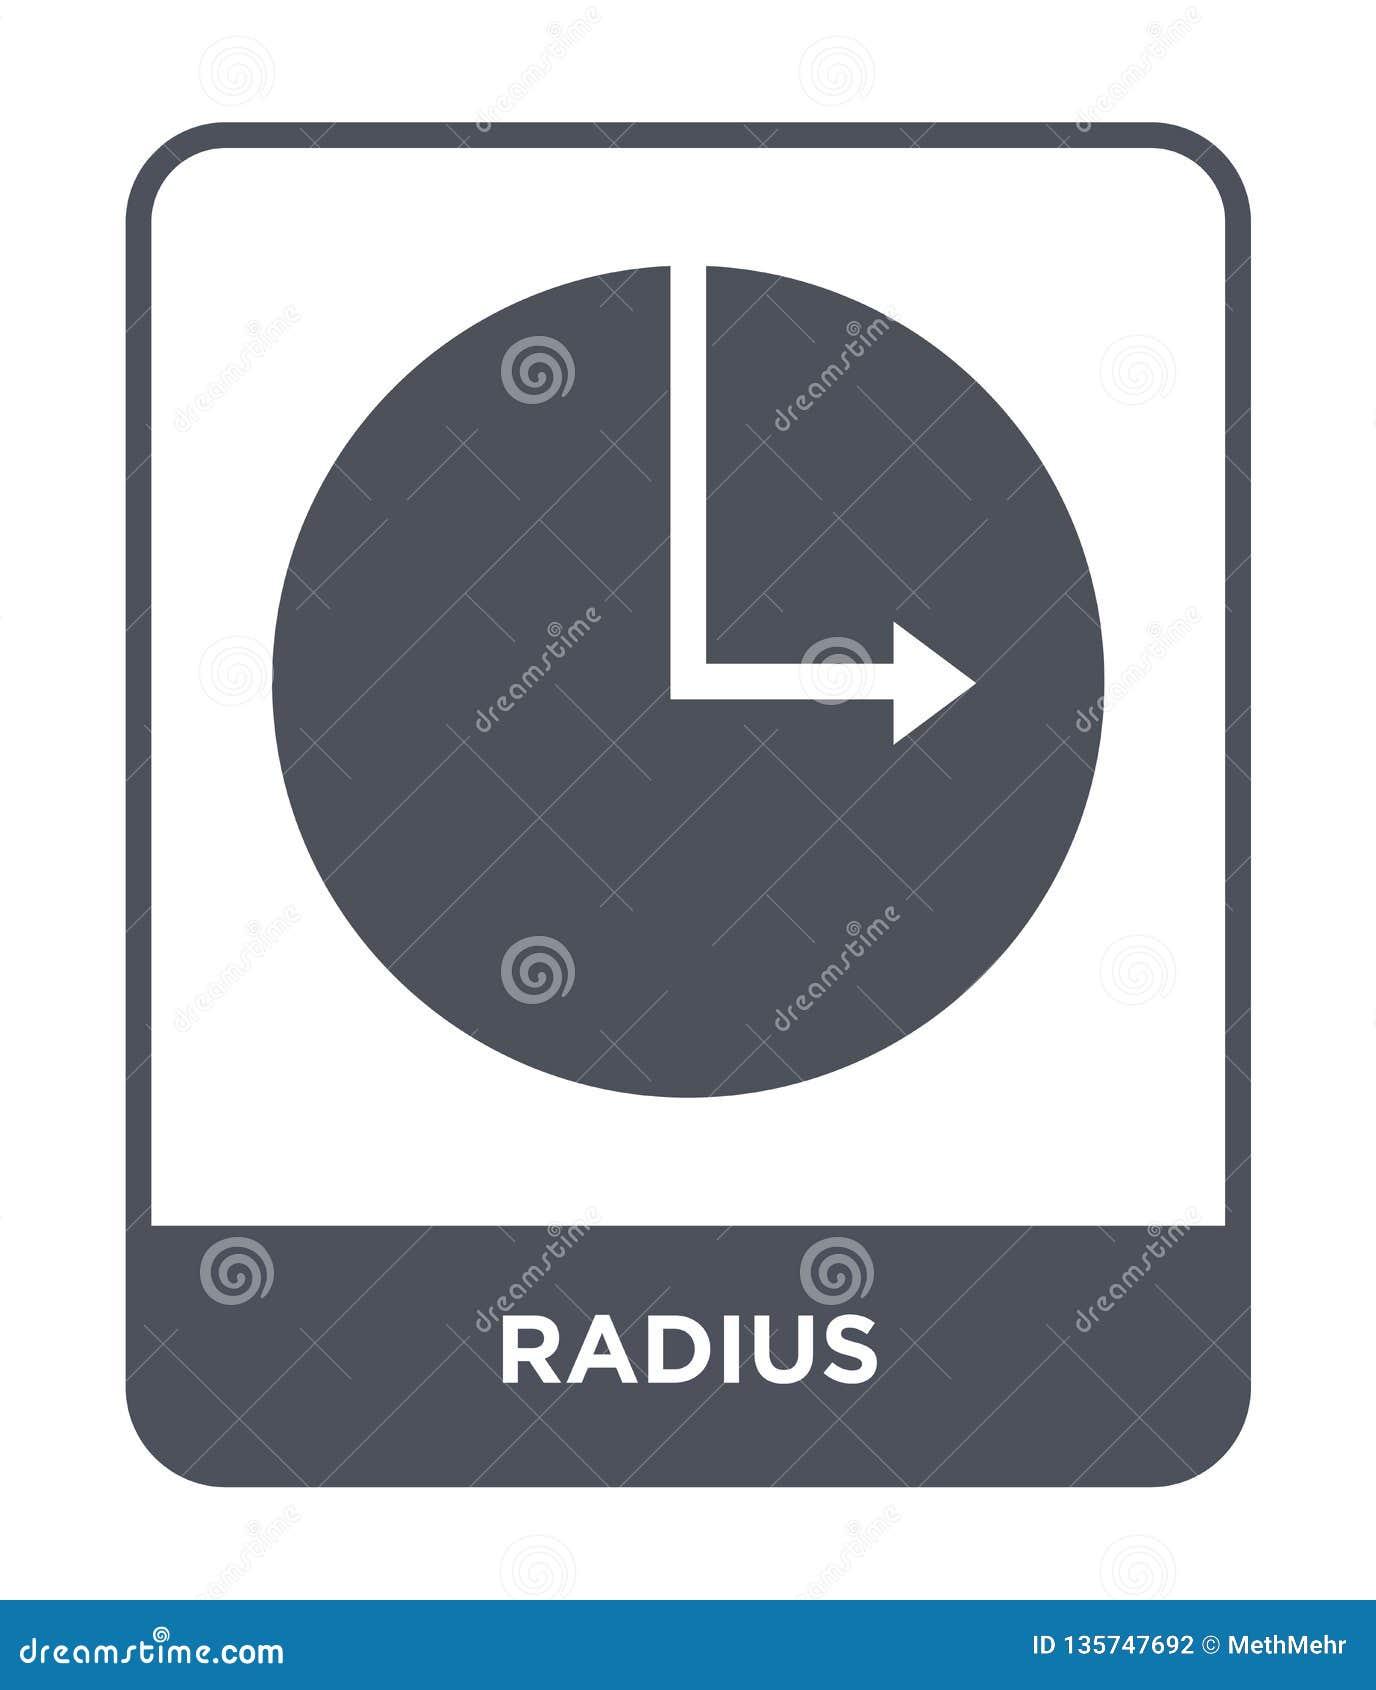 radius icon in trendy design style. radius icon isolated on white background. radius vector icon simple and modern flat symbol for